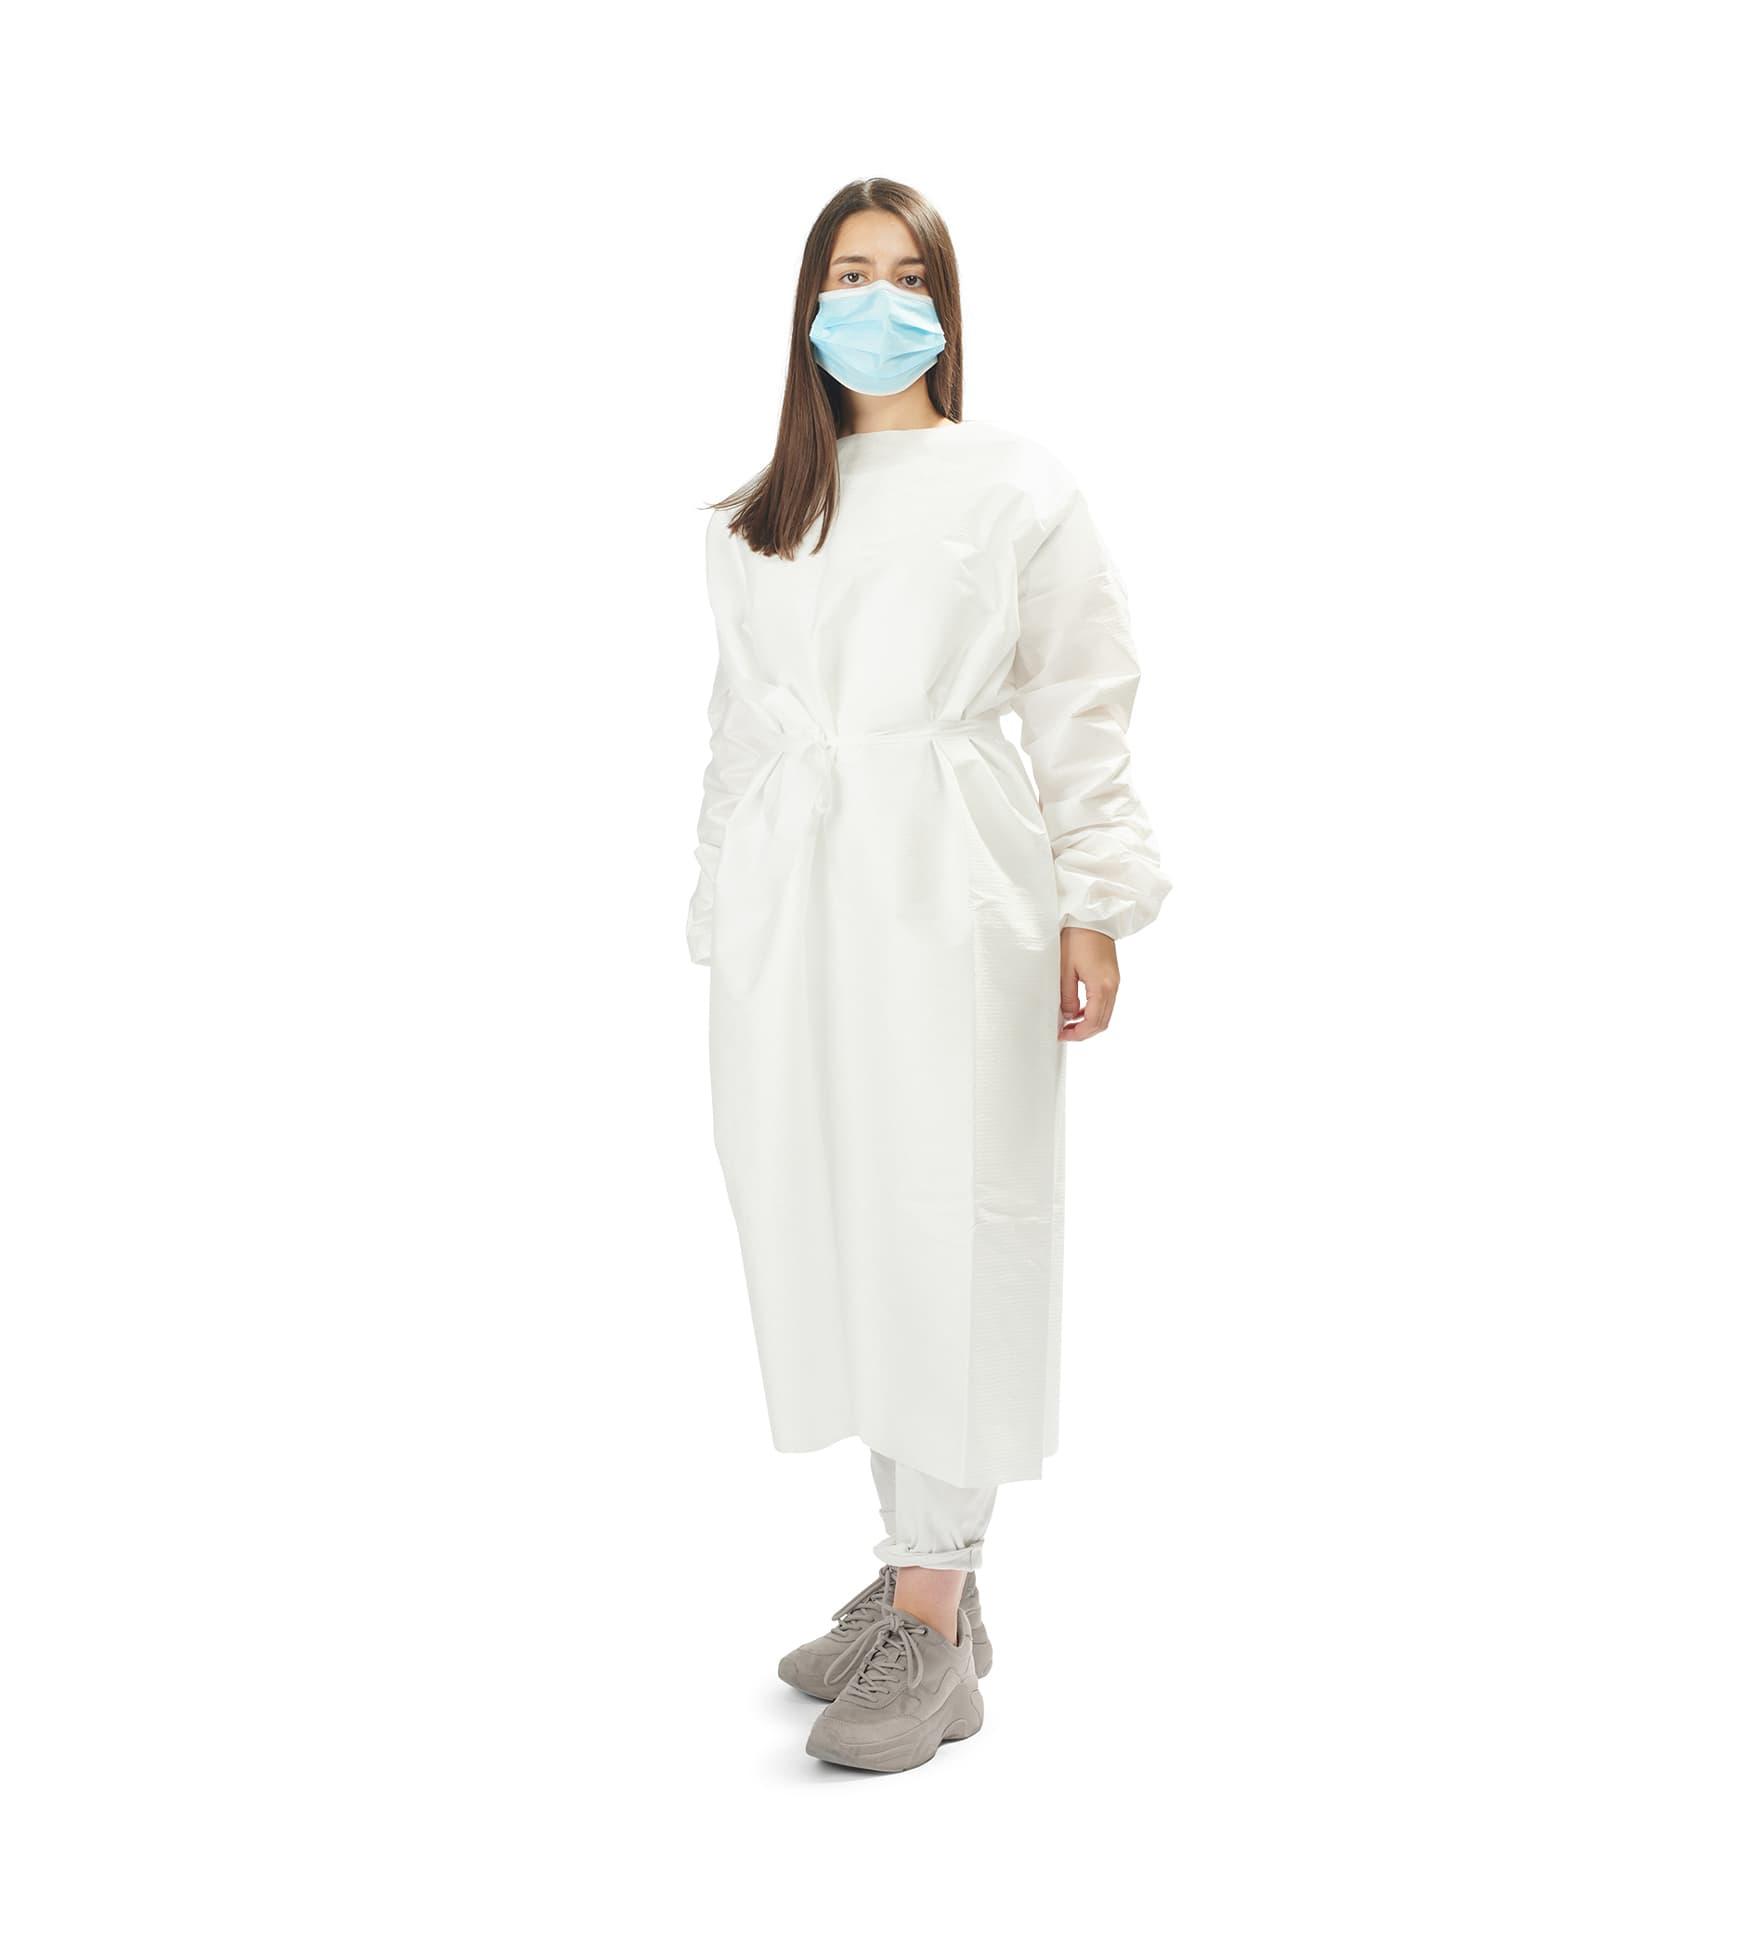 batas impermeáveis 2 - waterproof gowns - clothe protect